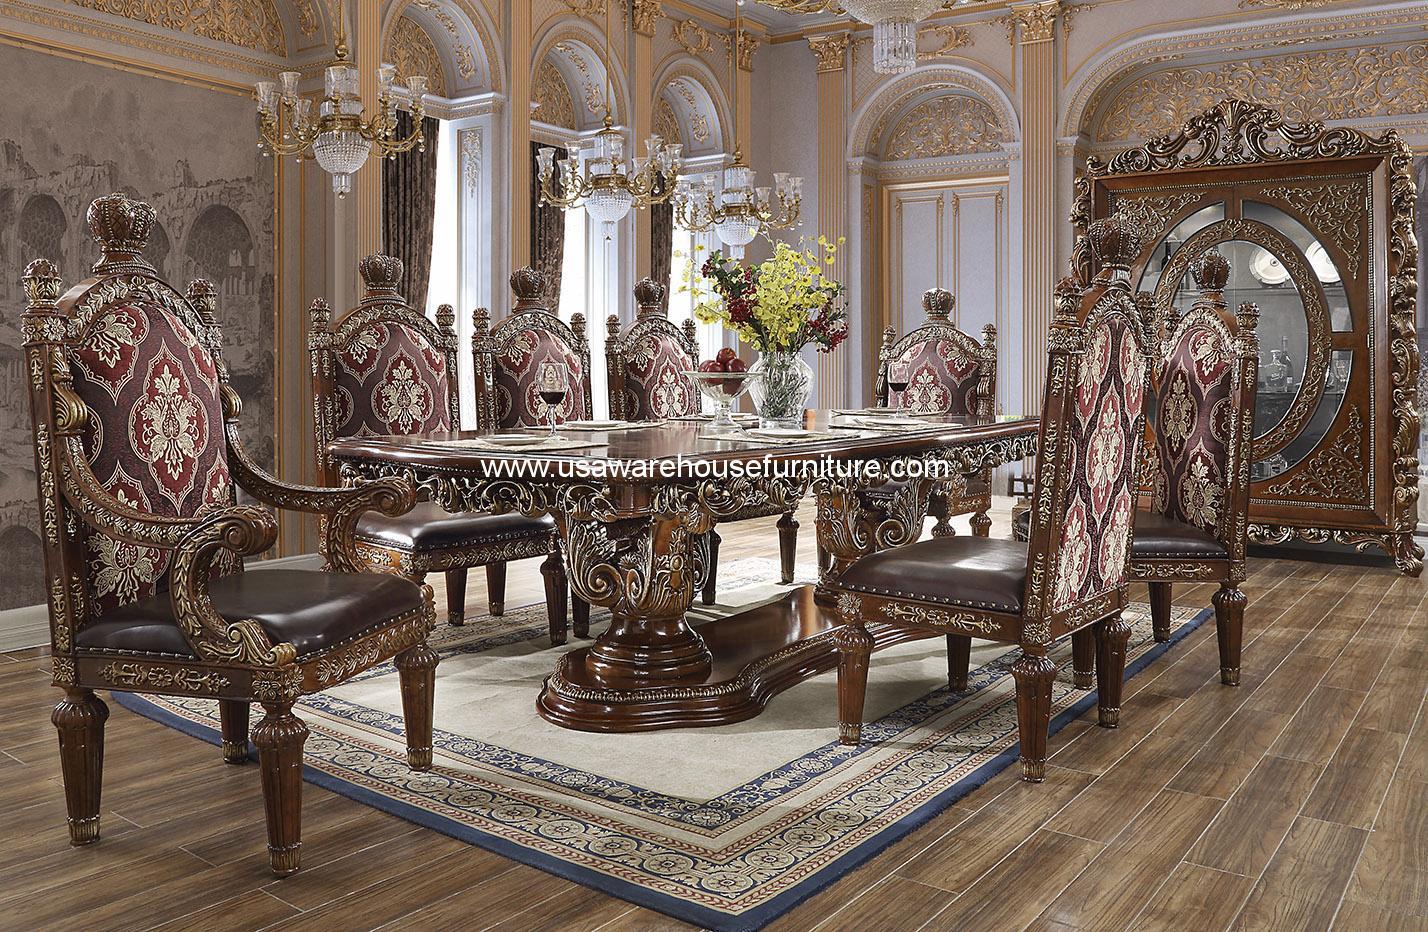 Hd 1804 Nathalia Victorian Dining Room Set Usa Warehouse Furniture